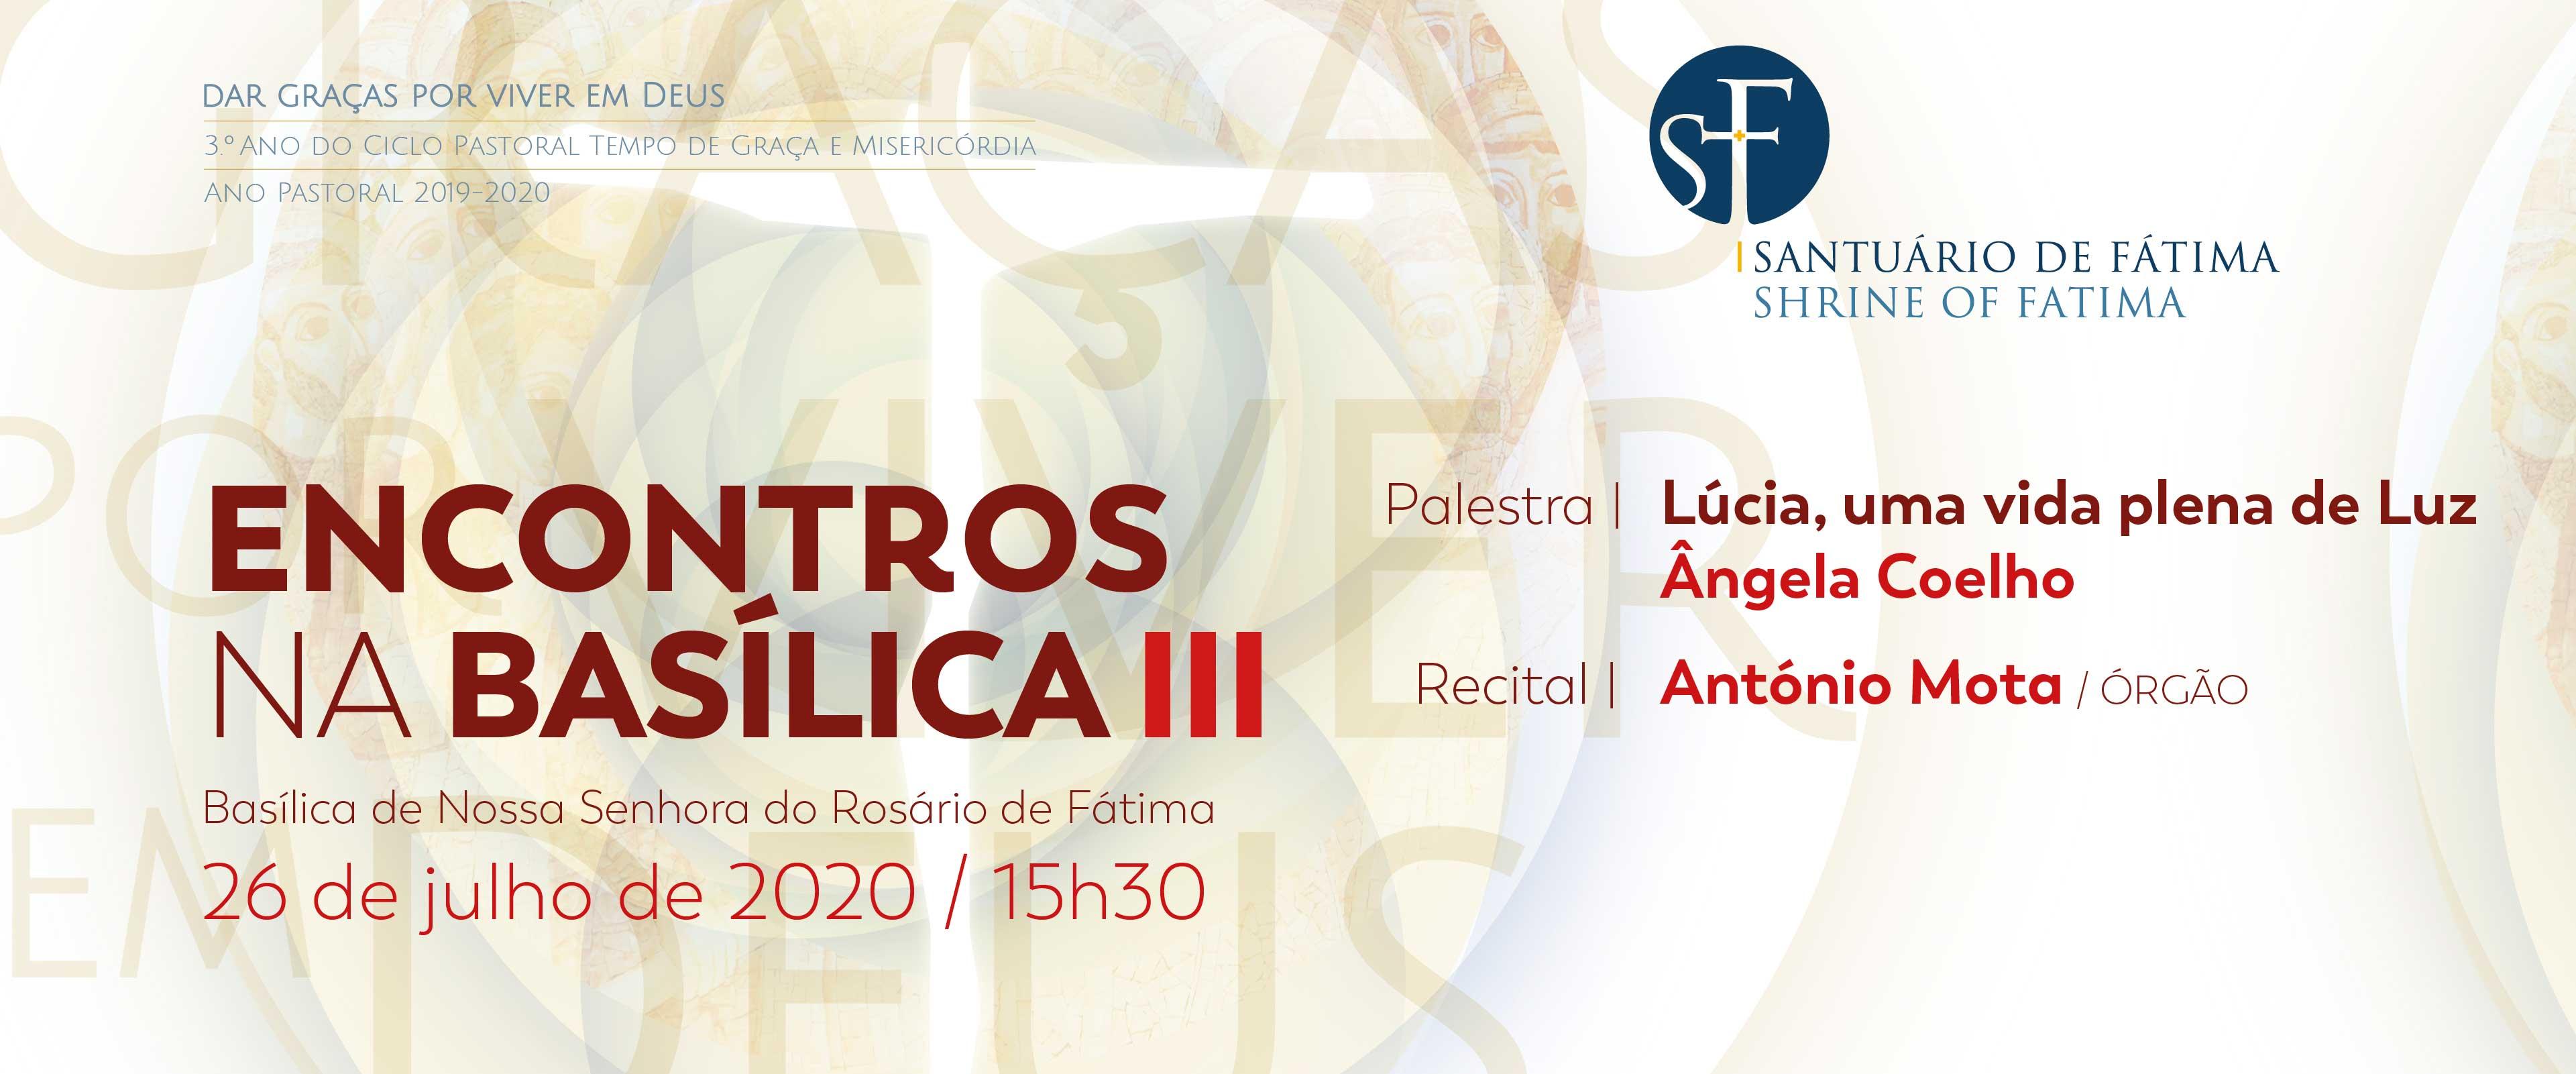 AF_BANNER-Encontros-na-Basilica-III@2x-100.jpg